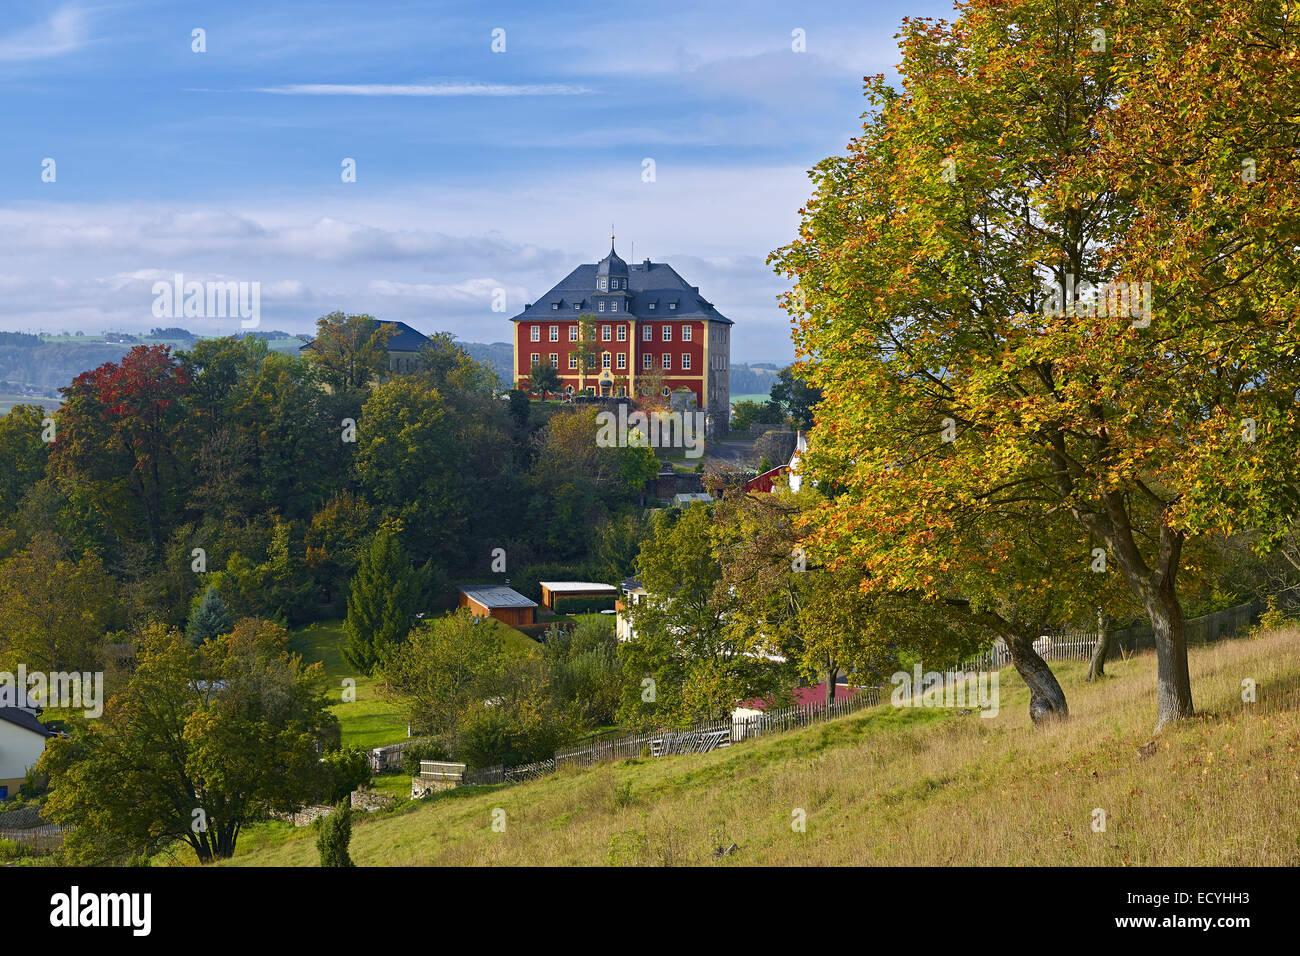 Castle Brandenstein near Ranis, Thuringia, Germany - Stock Image